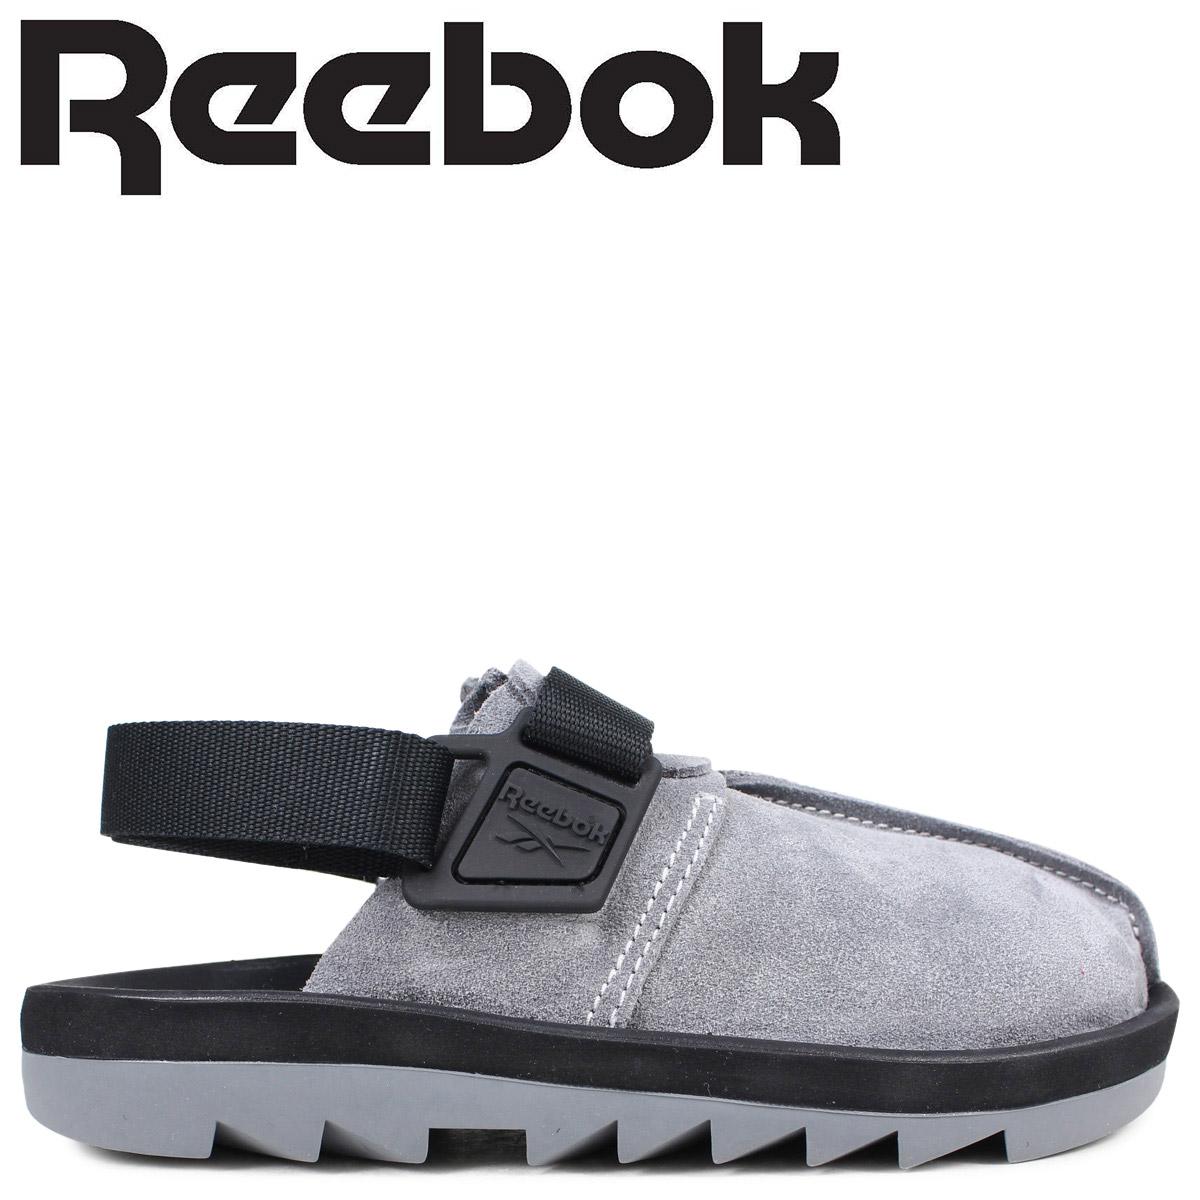 Reebok ビートニック レディース メンズ サンダル リーボック BEATNIK CN3730 グレー